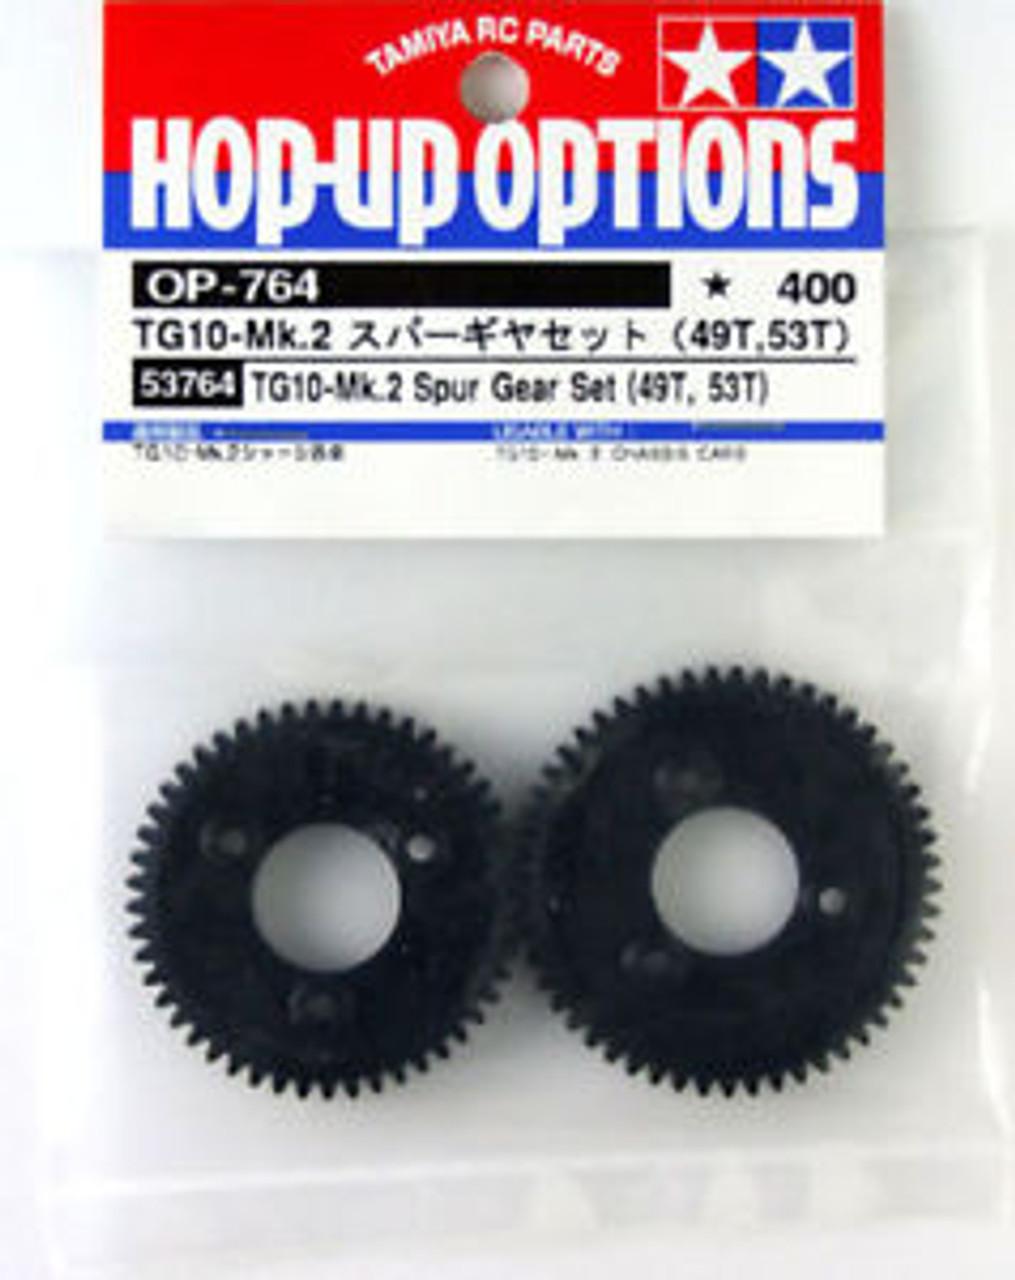 OP764 TG10-Mk.2 Spur Gear Set 49T,53T Tamiya 53764